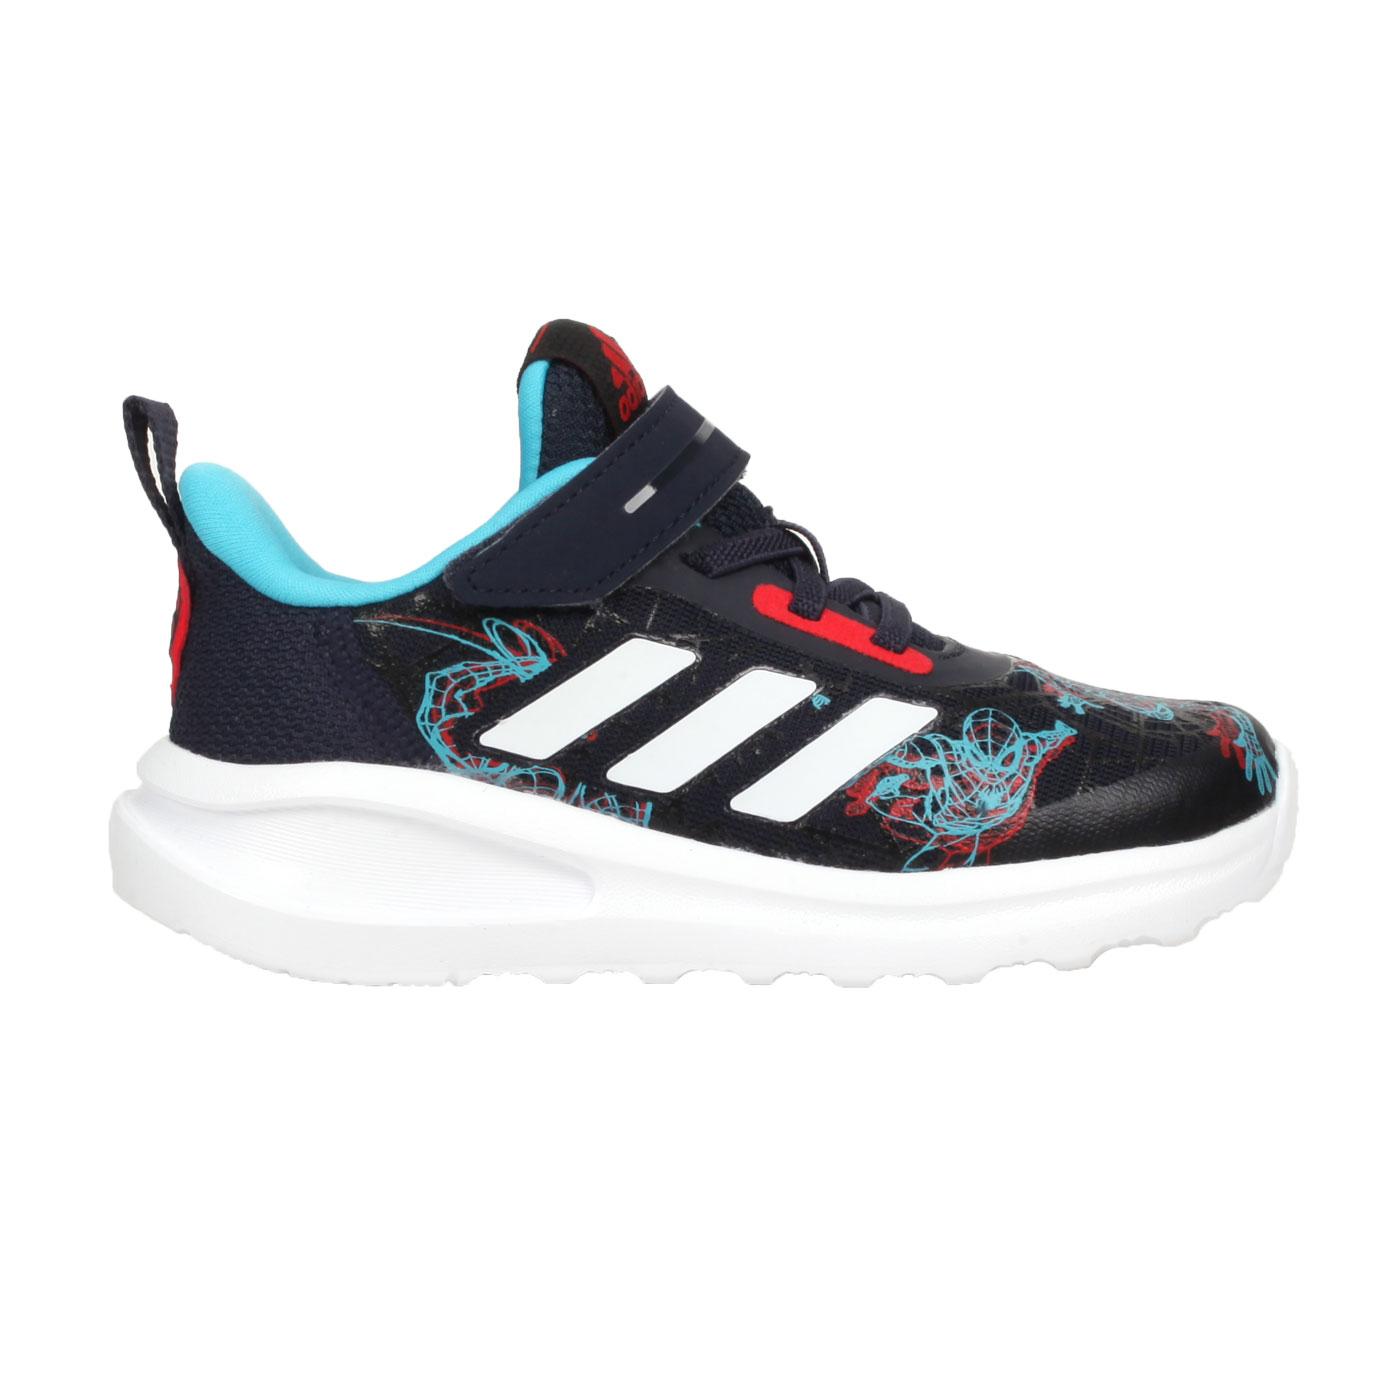 ADIDAS 小童休閒鞋  @FortaRun Spider-M EL I@FV4267 - 丈青藍紅